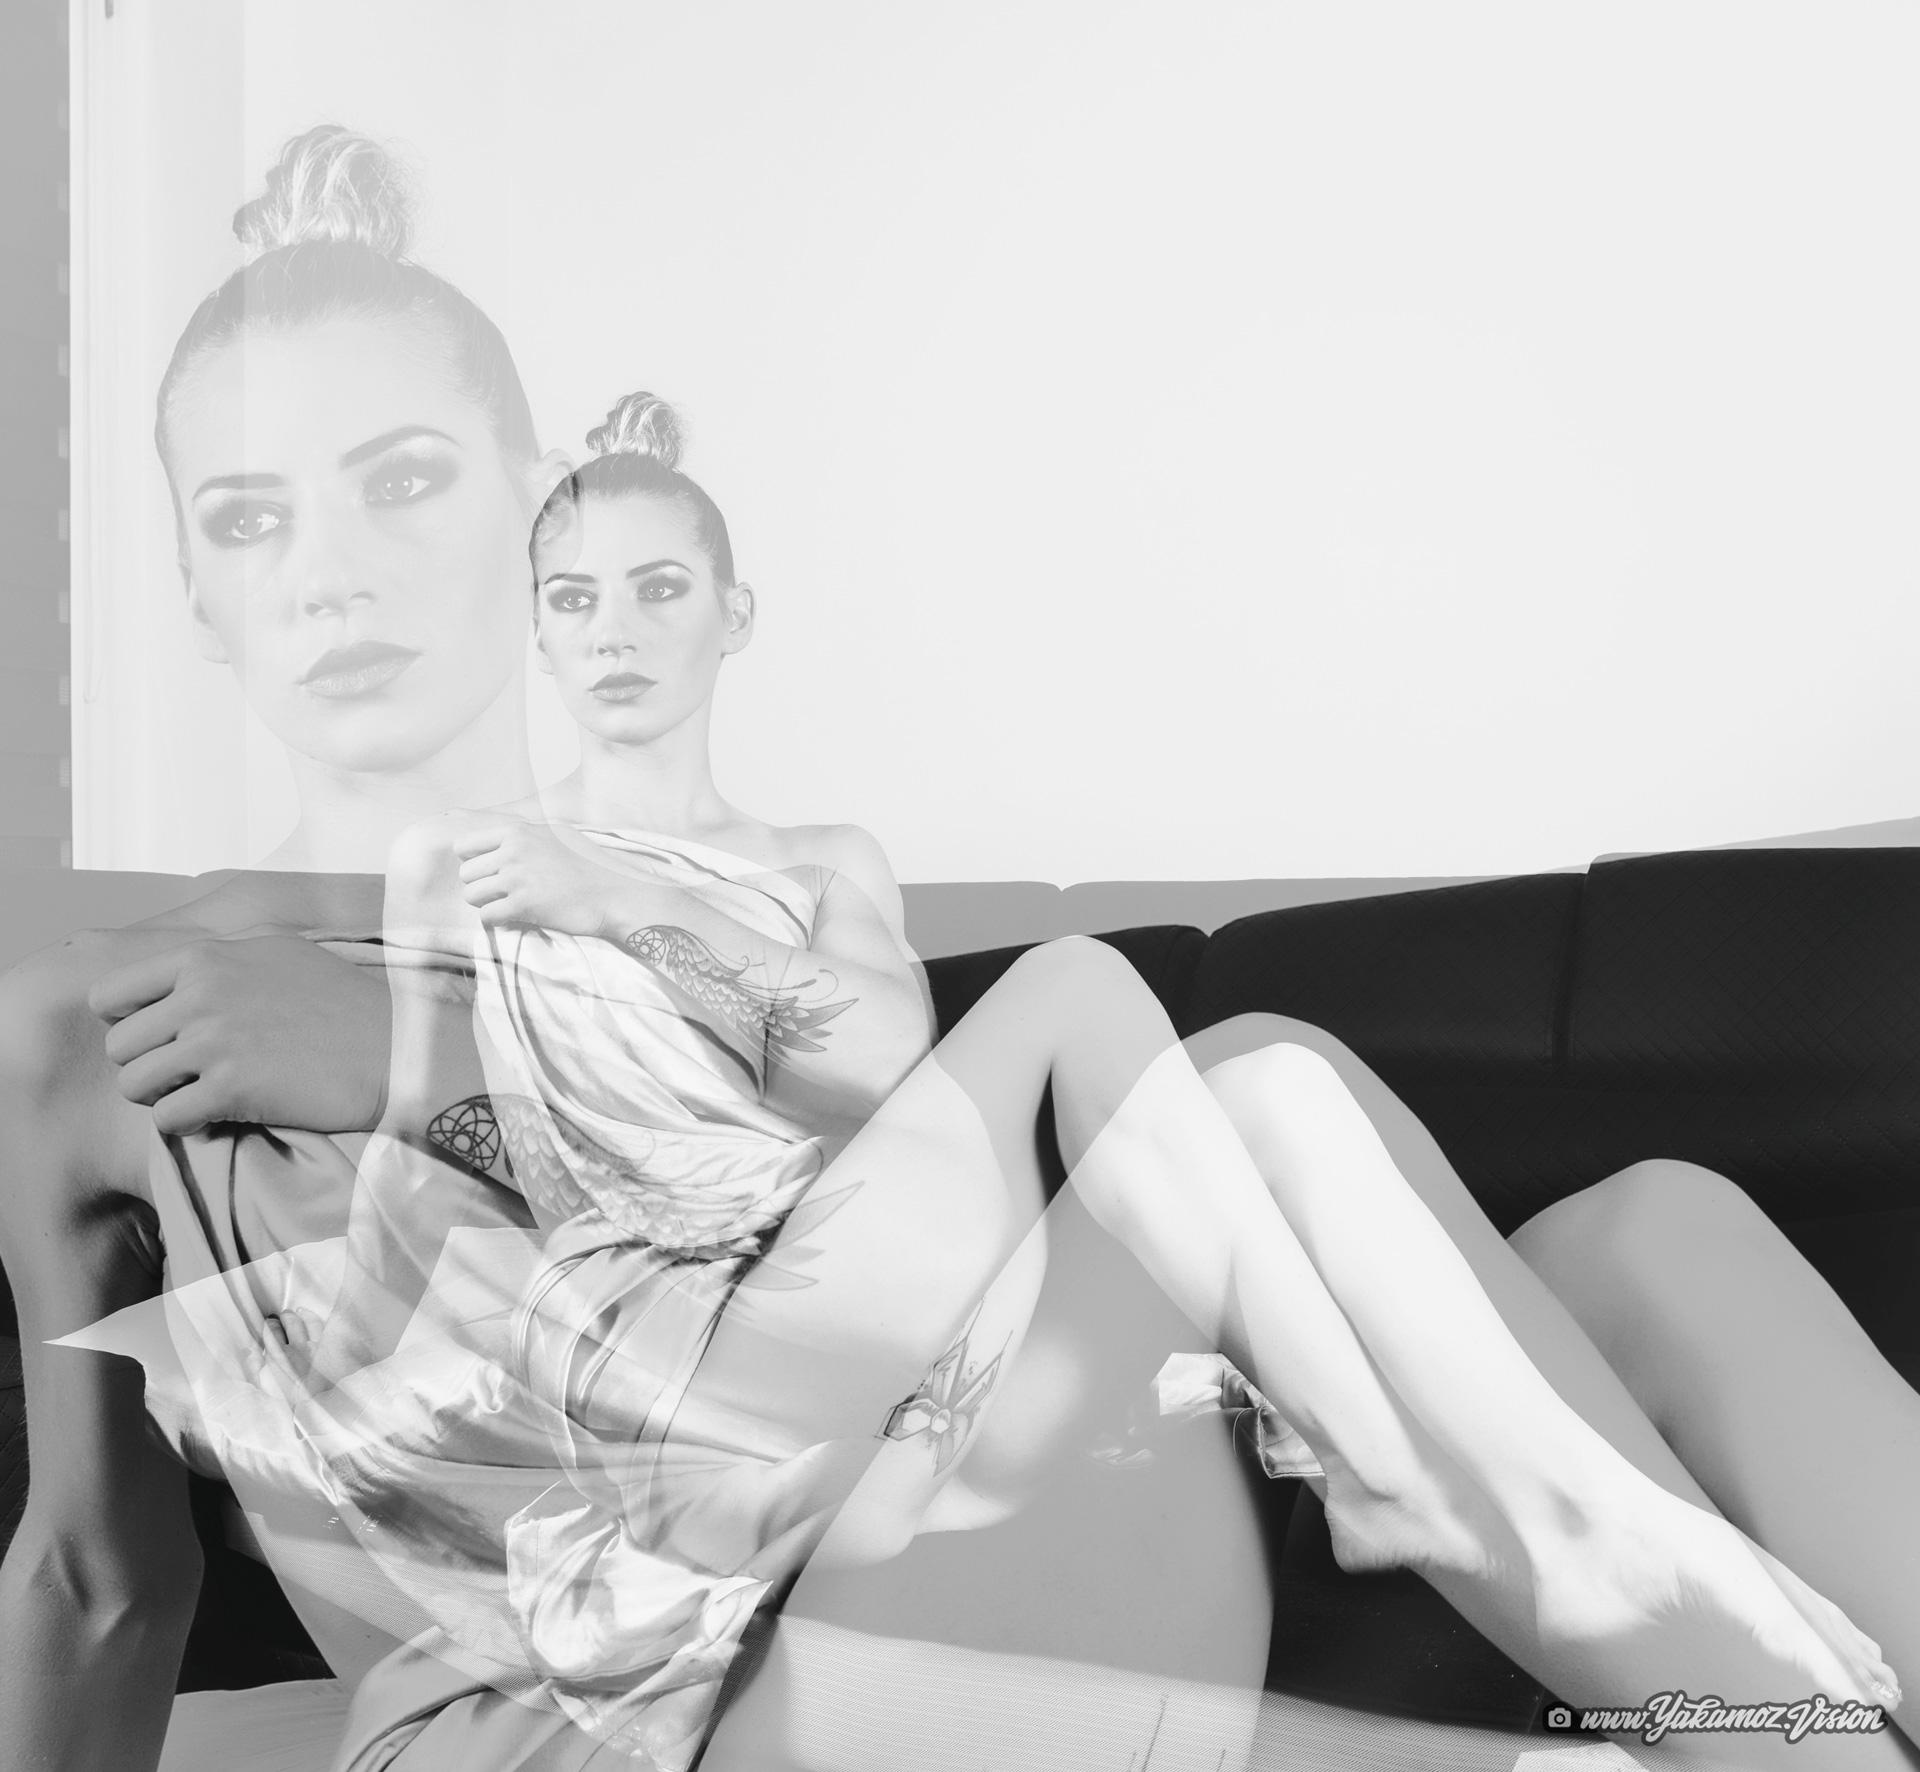 podwójna ekspozycja modelka fotografia